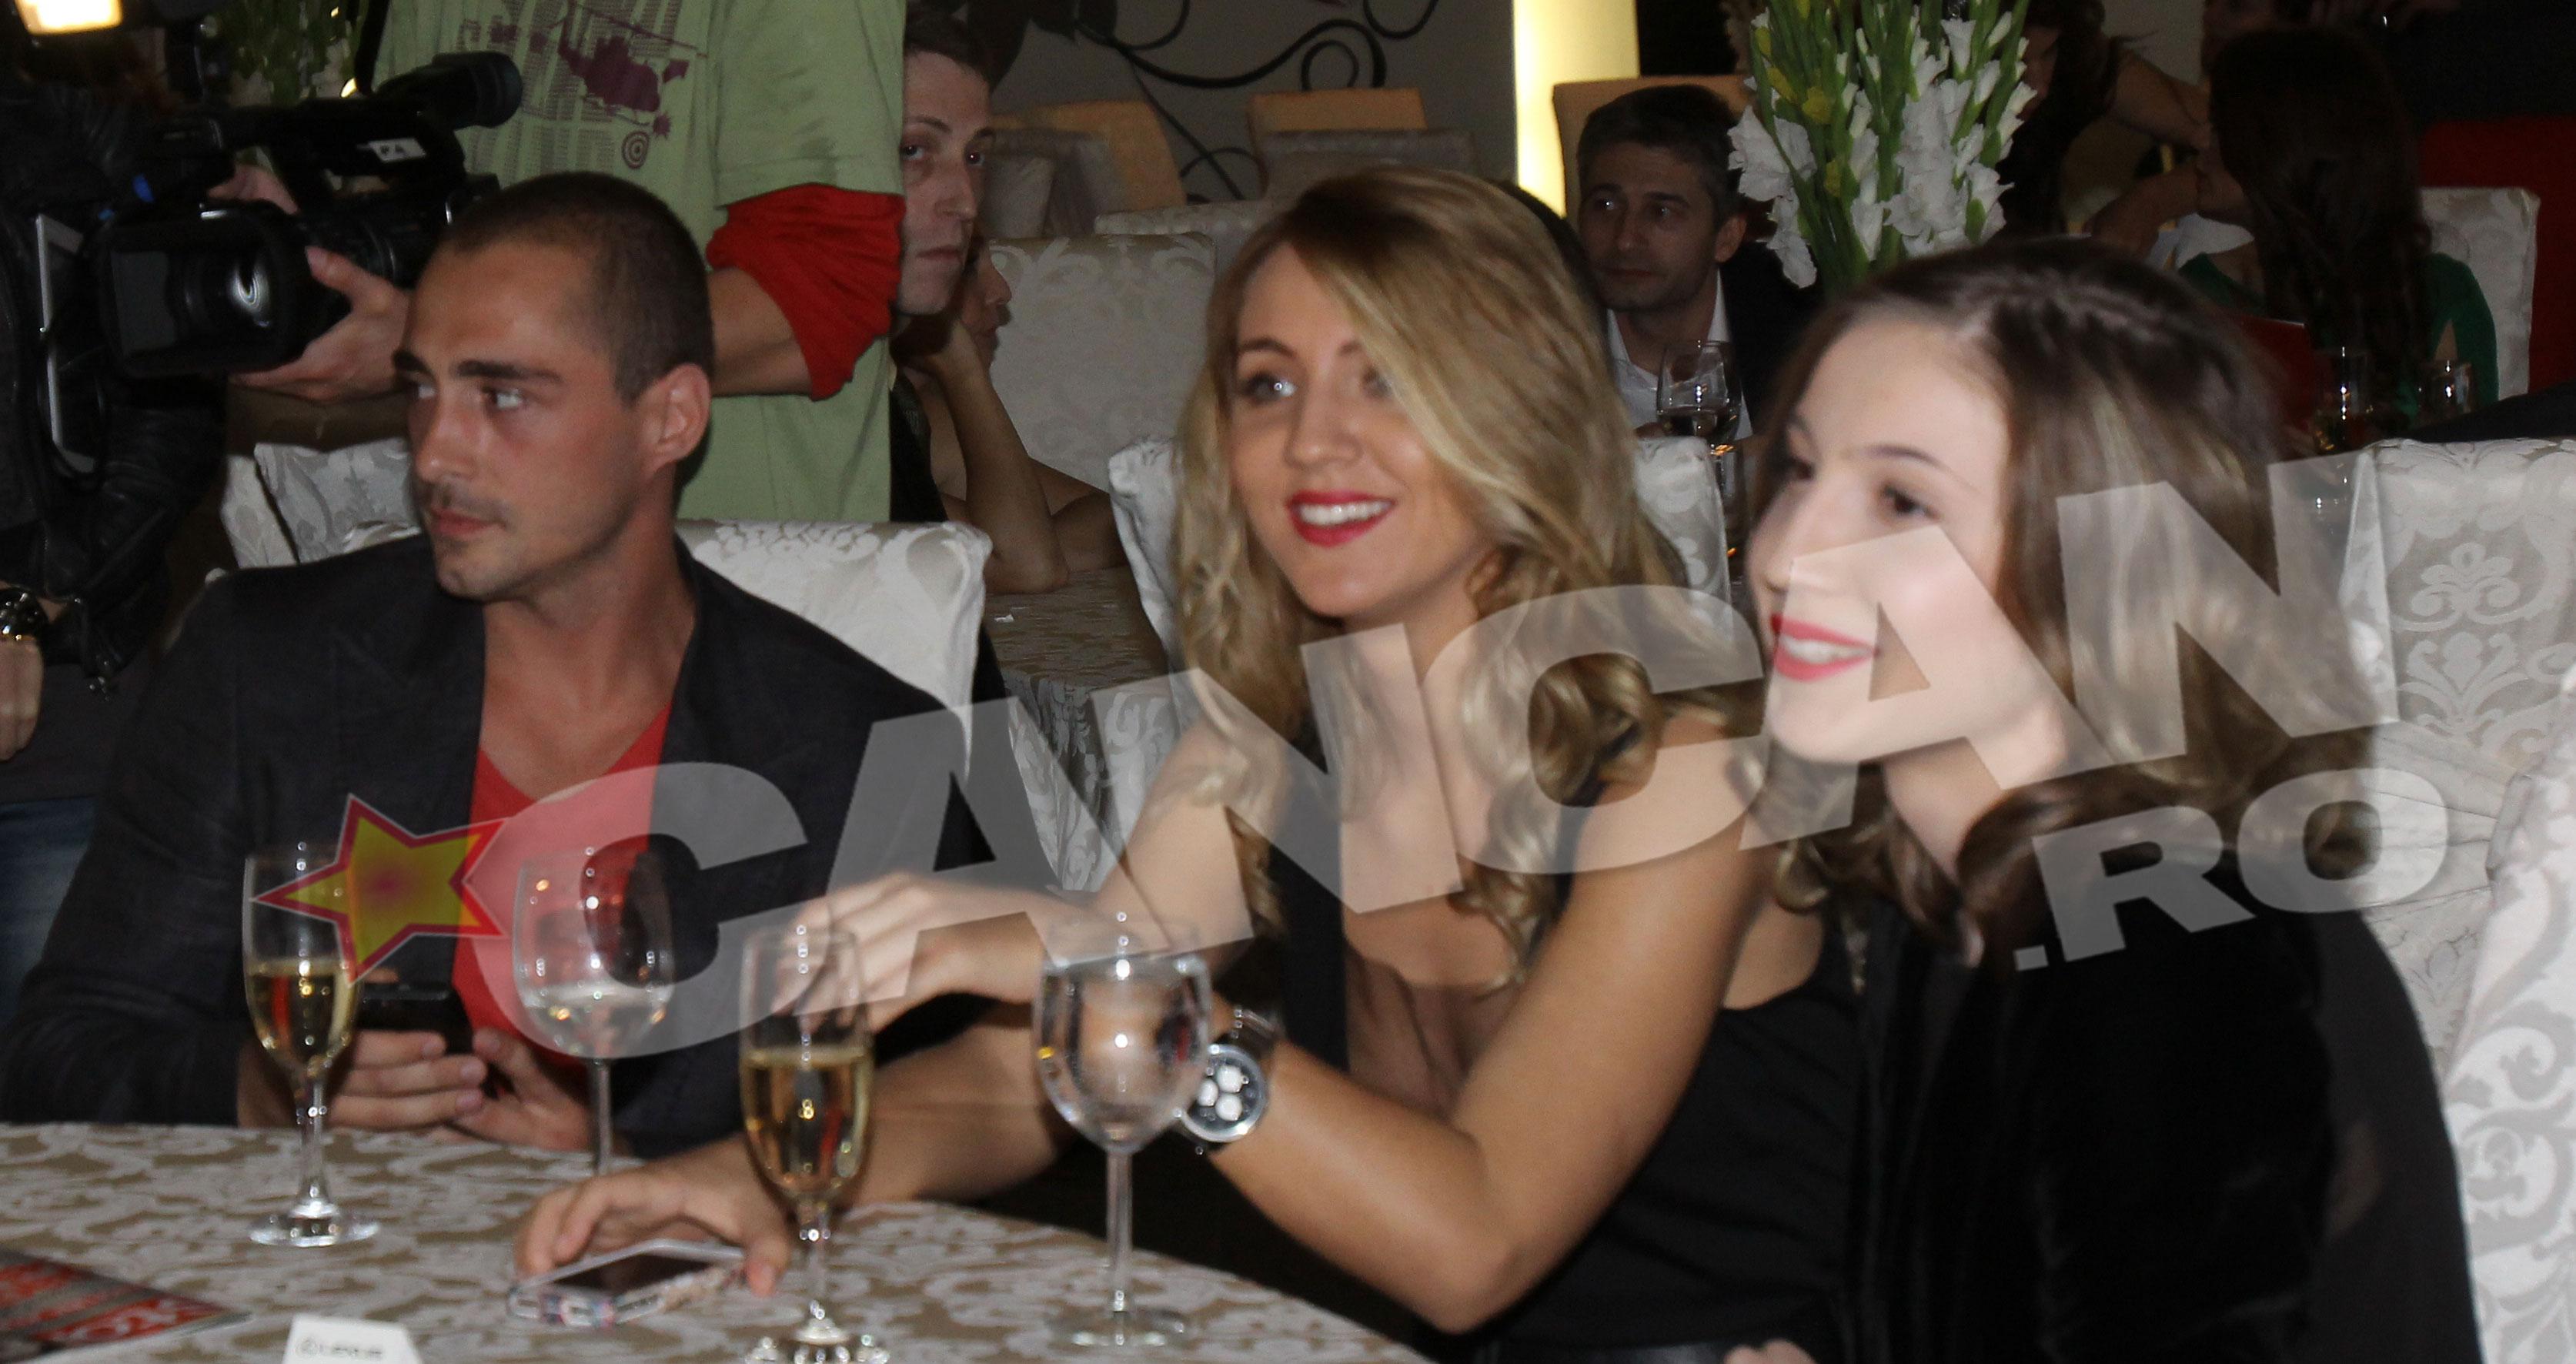 Saptamana trecuta, Ana a iesit la un eveniment monden alaturi de Vladimir si sora ei, Monica